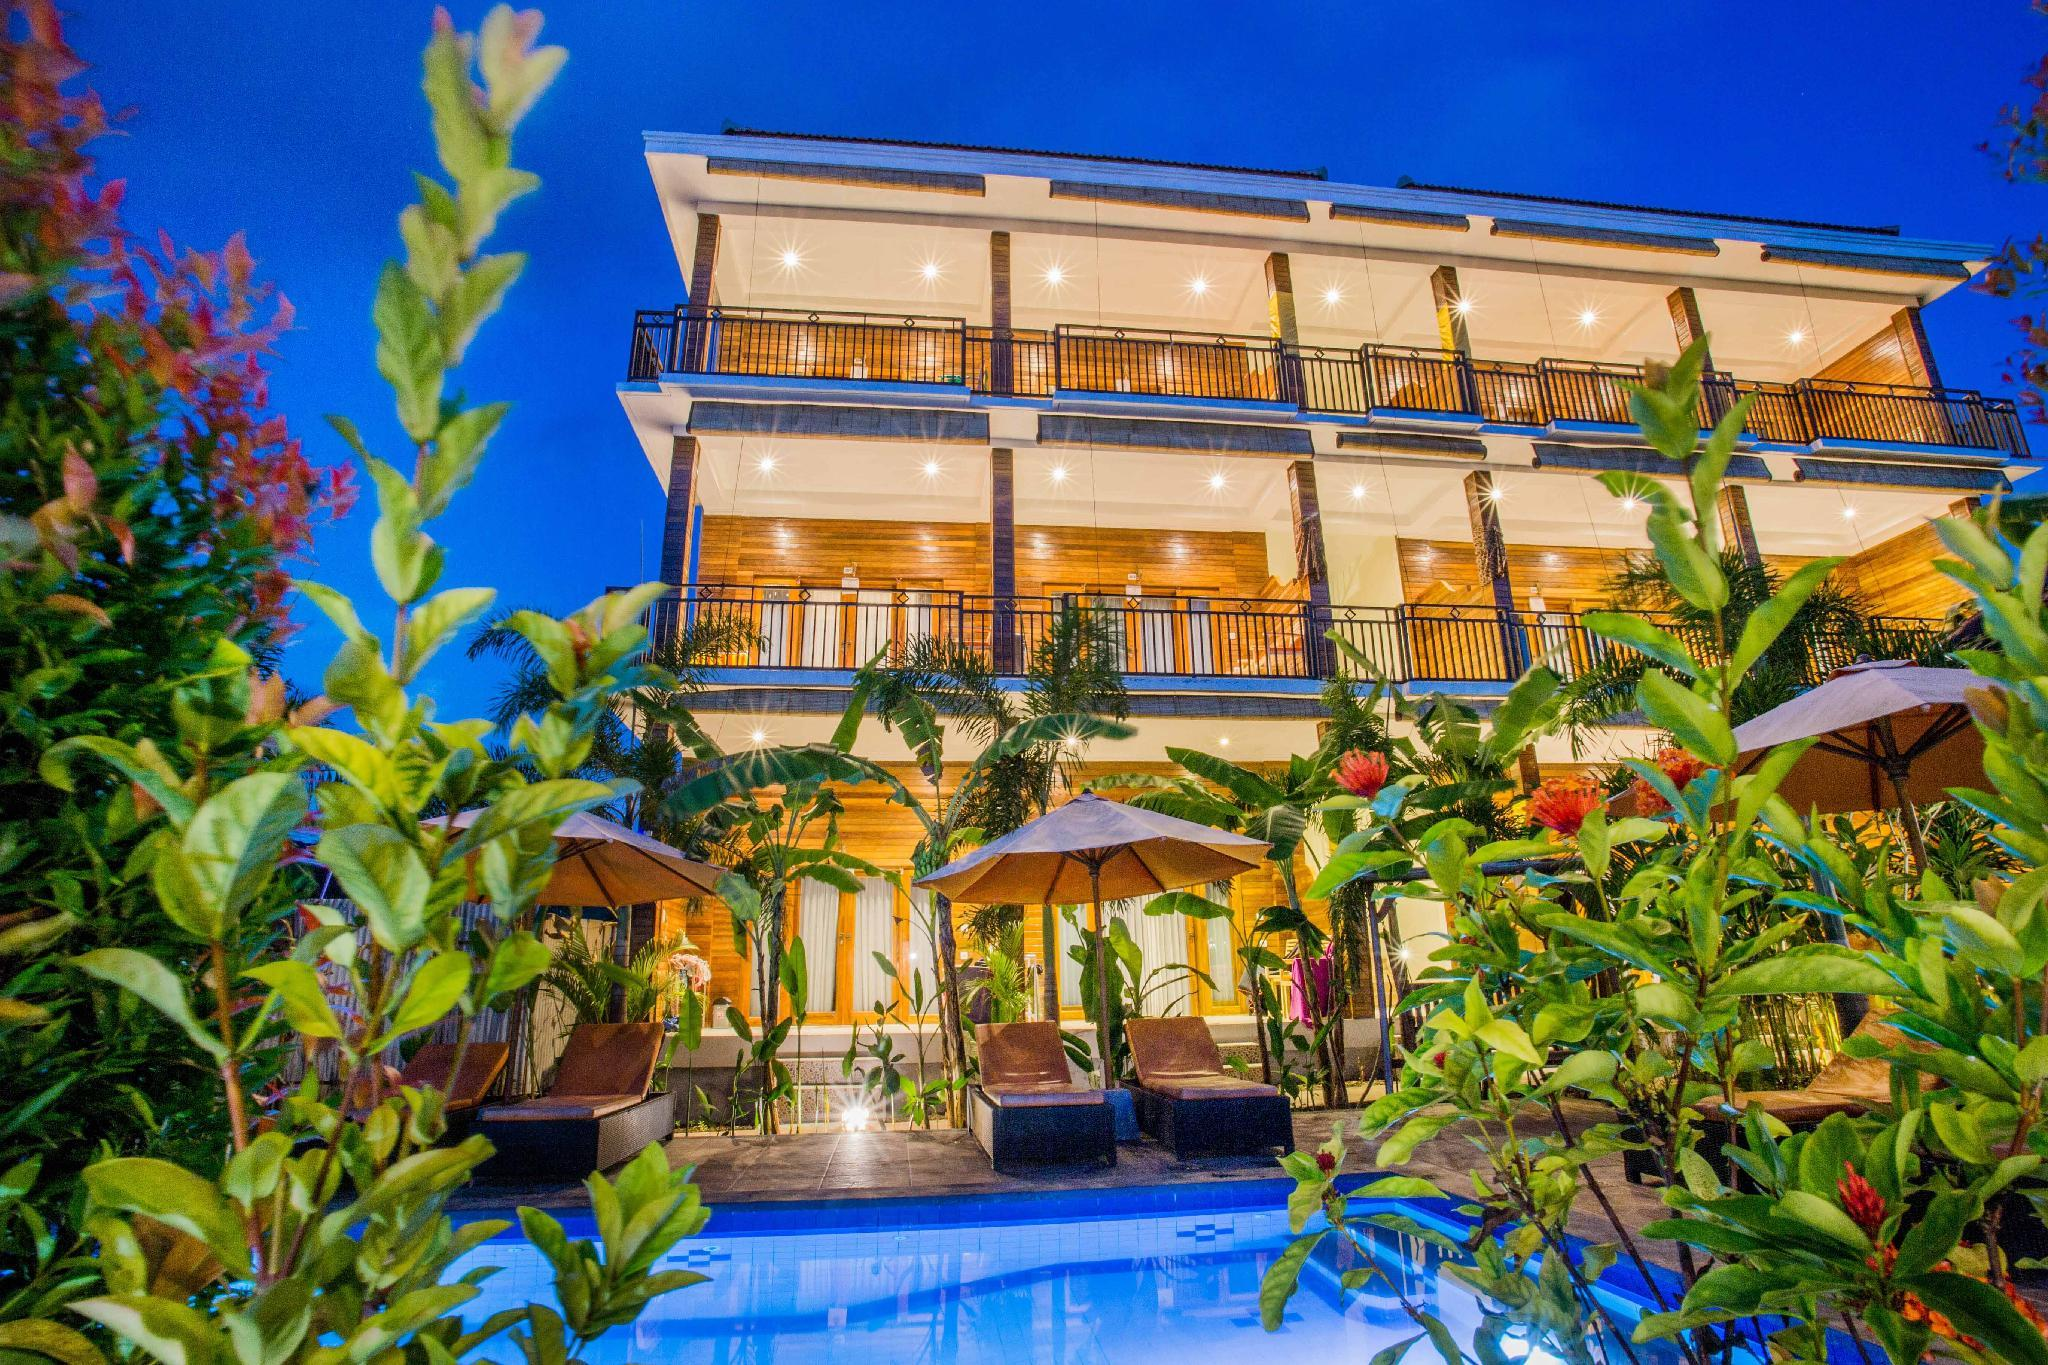 Dinatah Lembongan Villas, Klungkung